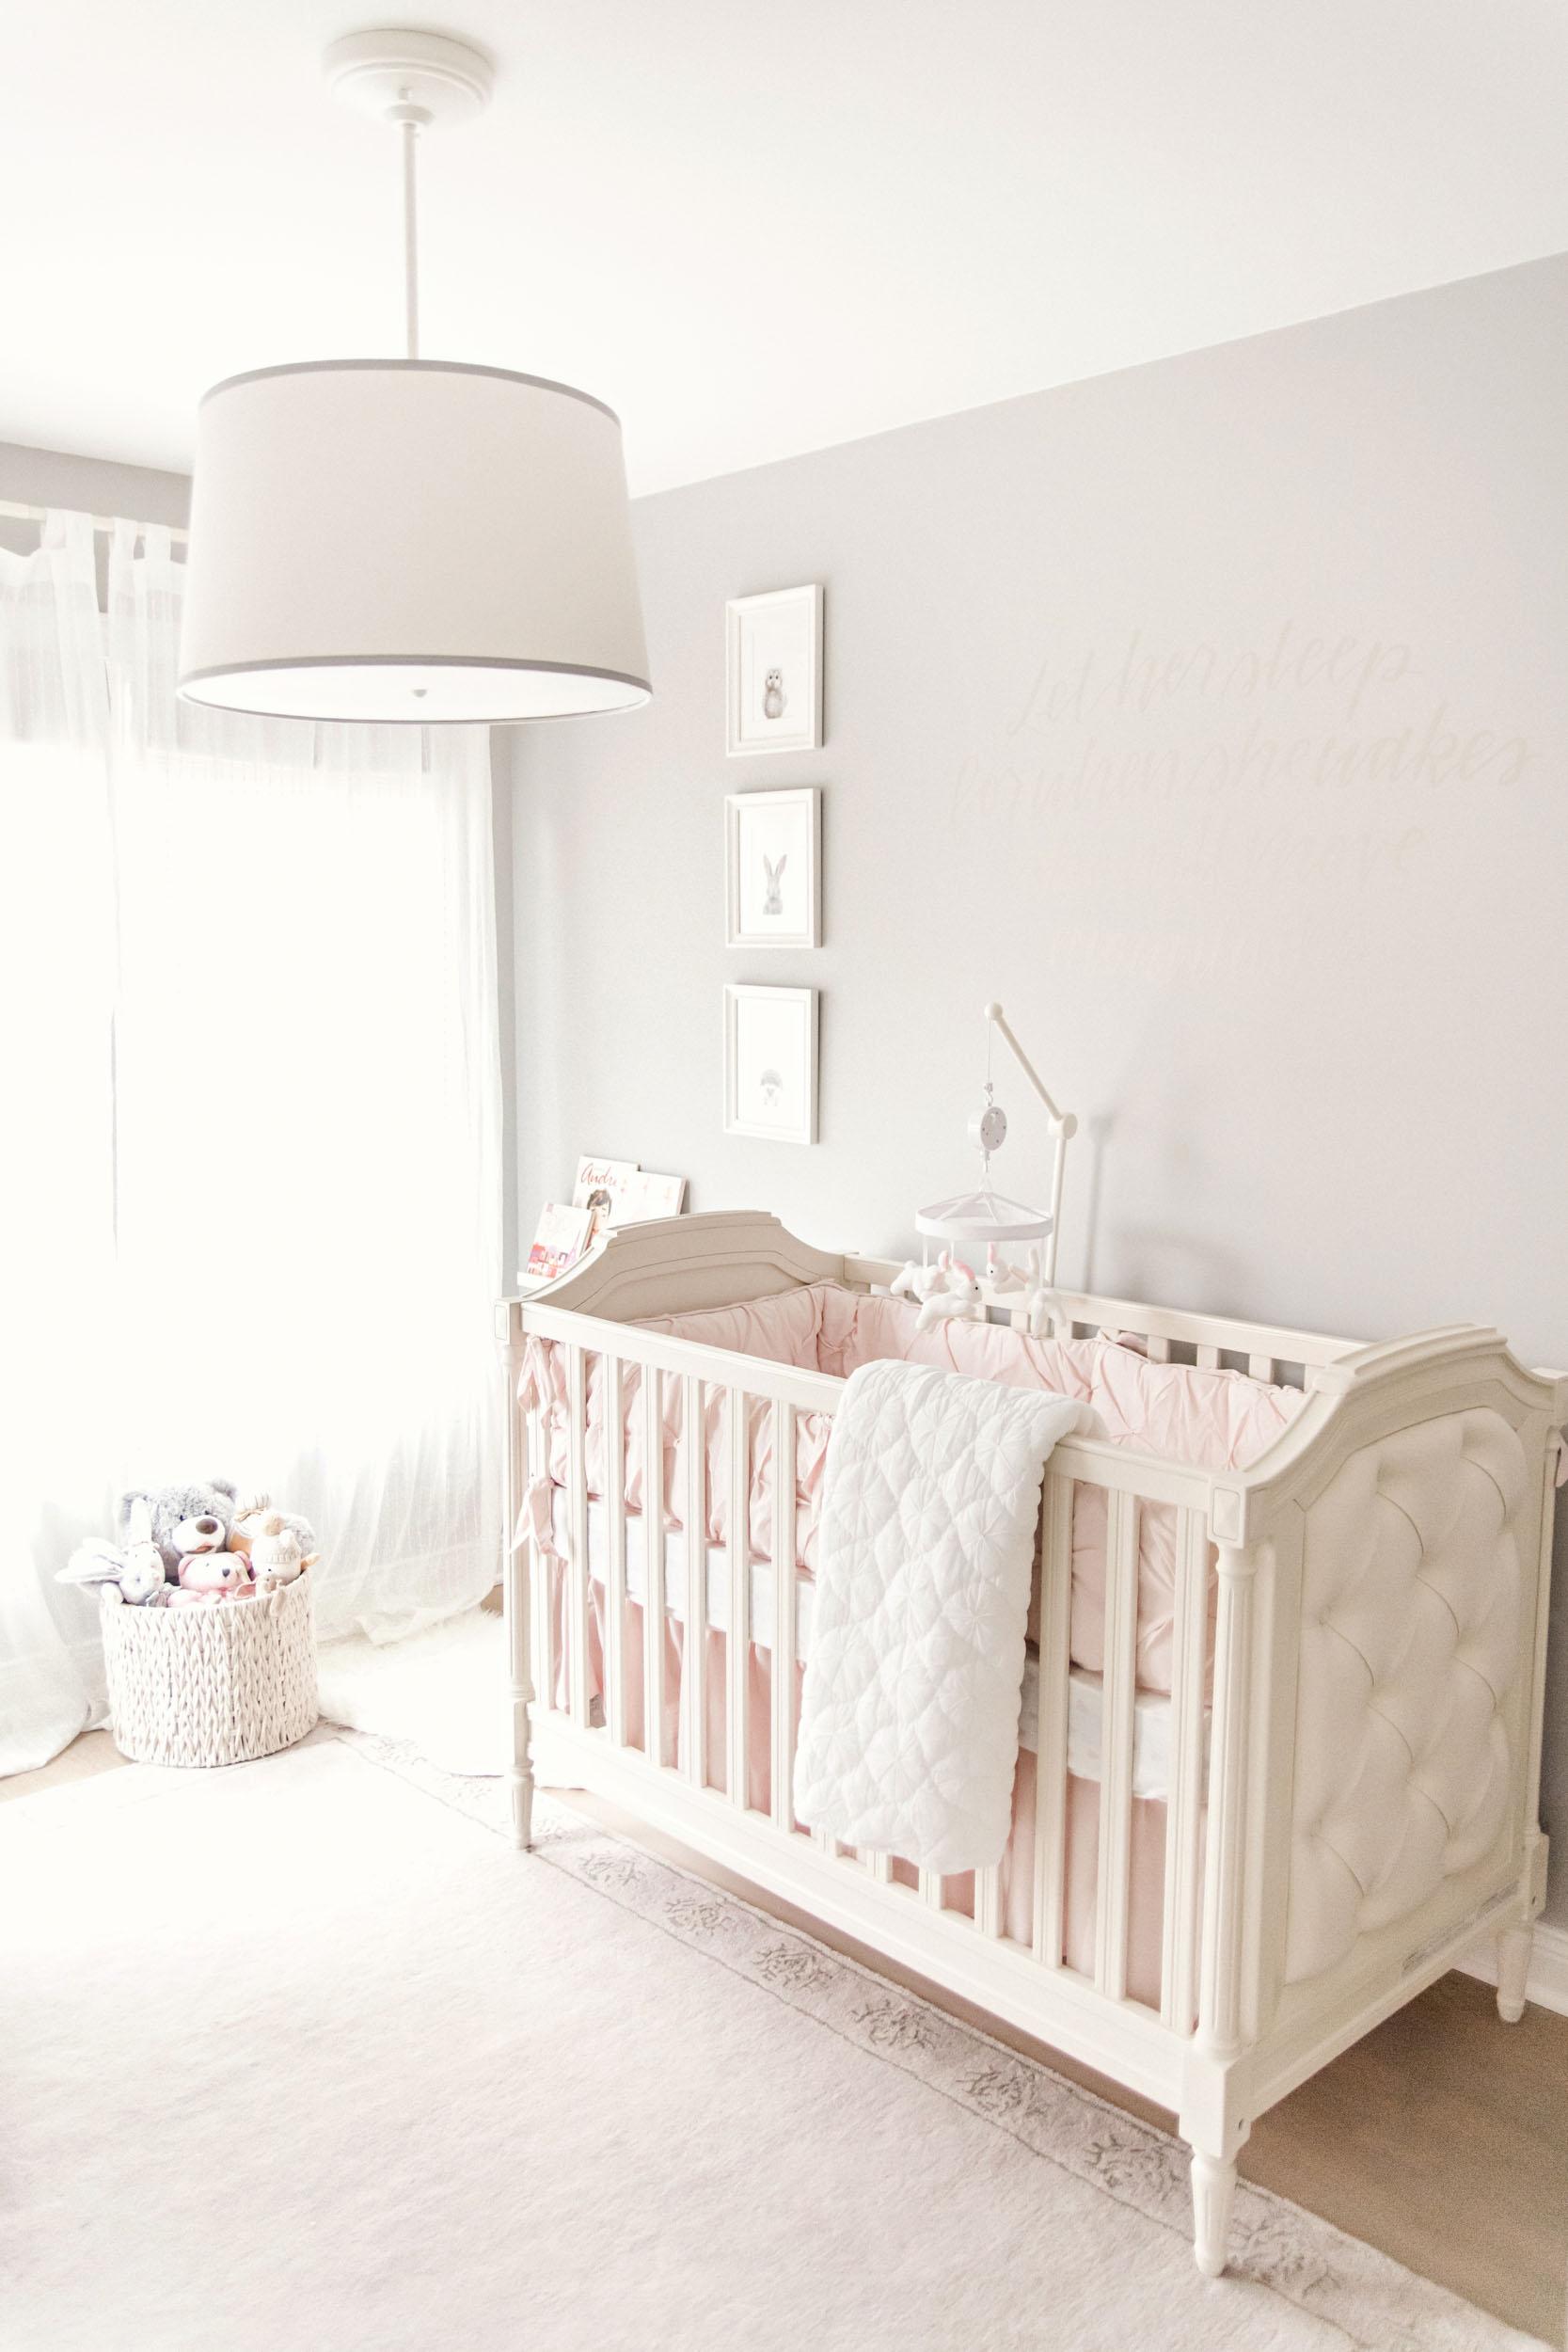 Cassie Schott Photography_Chicago Suburbs Newborn and Baby Photographer_Nursery Inspiration.jpg